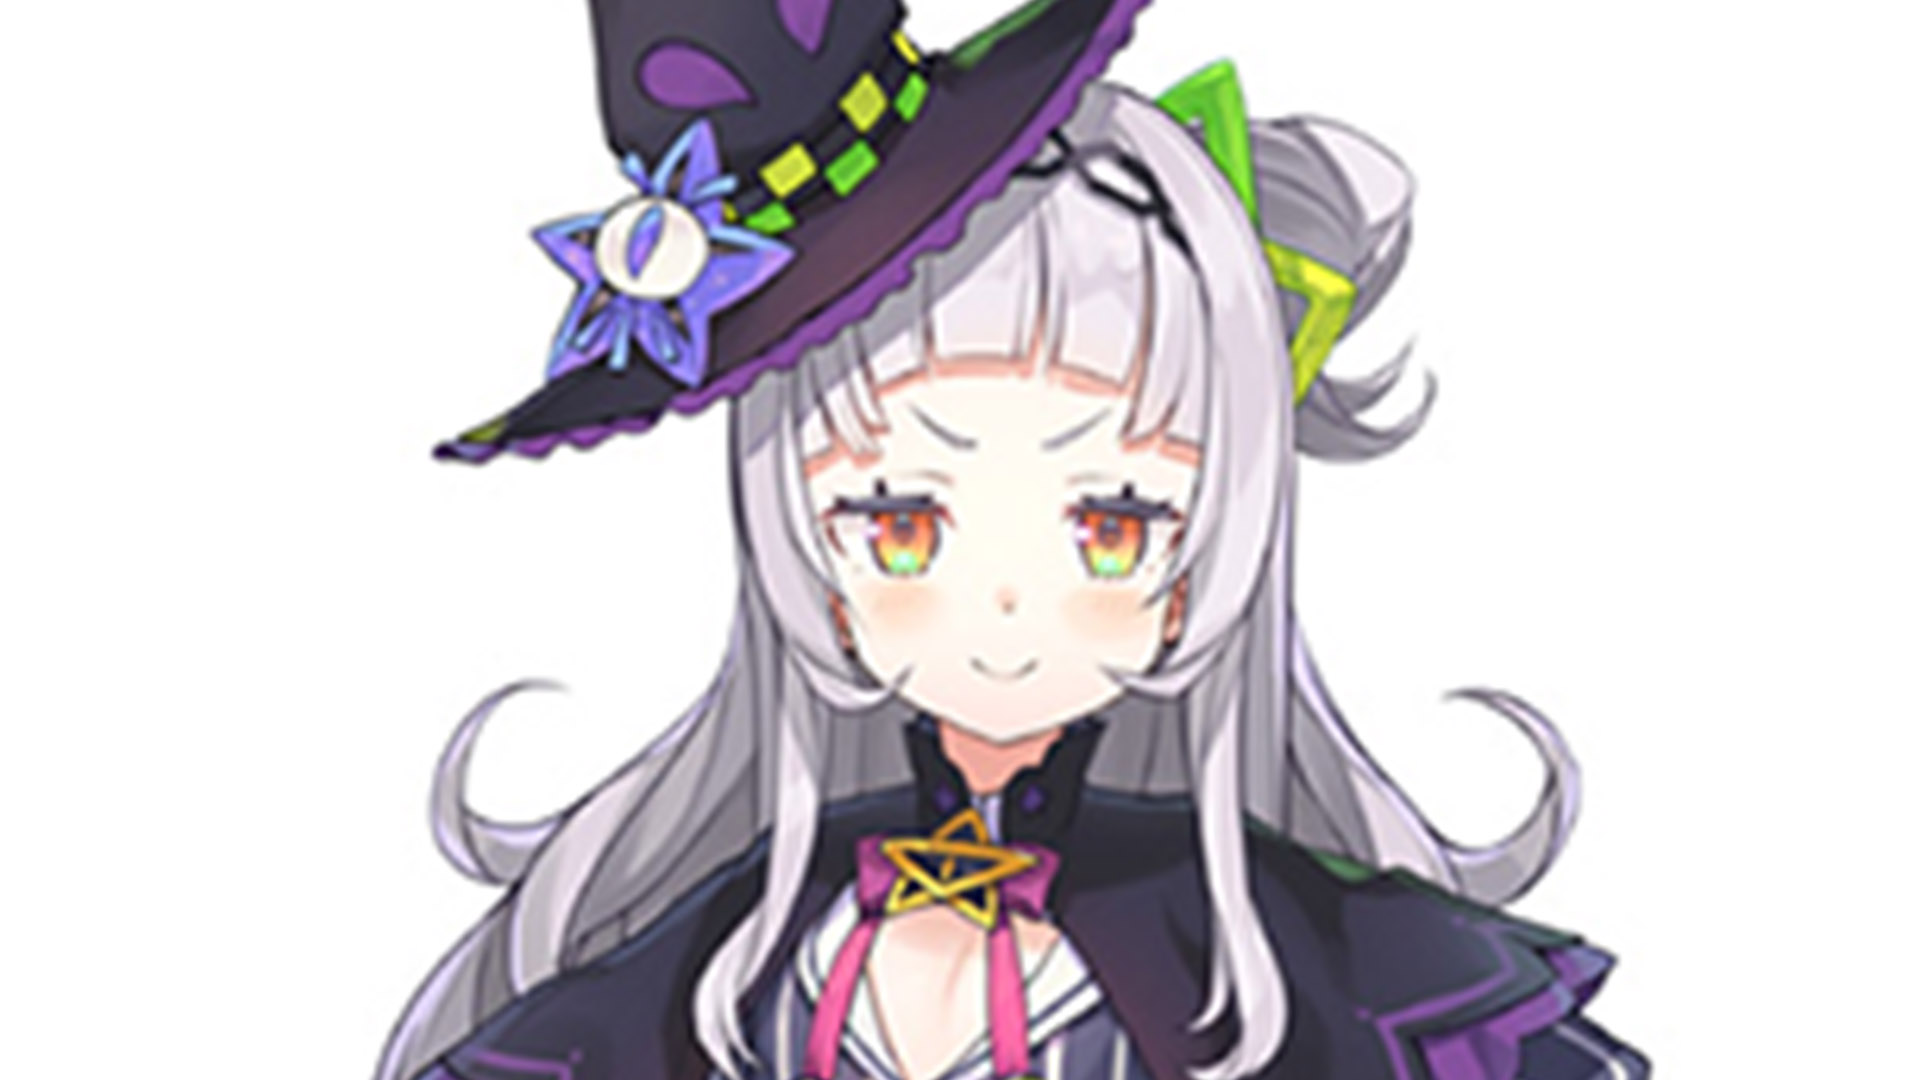 【VTuber「紫咲シオン」新衣装8月1日夜公開】他、新着トレンド8月1日